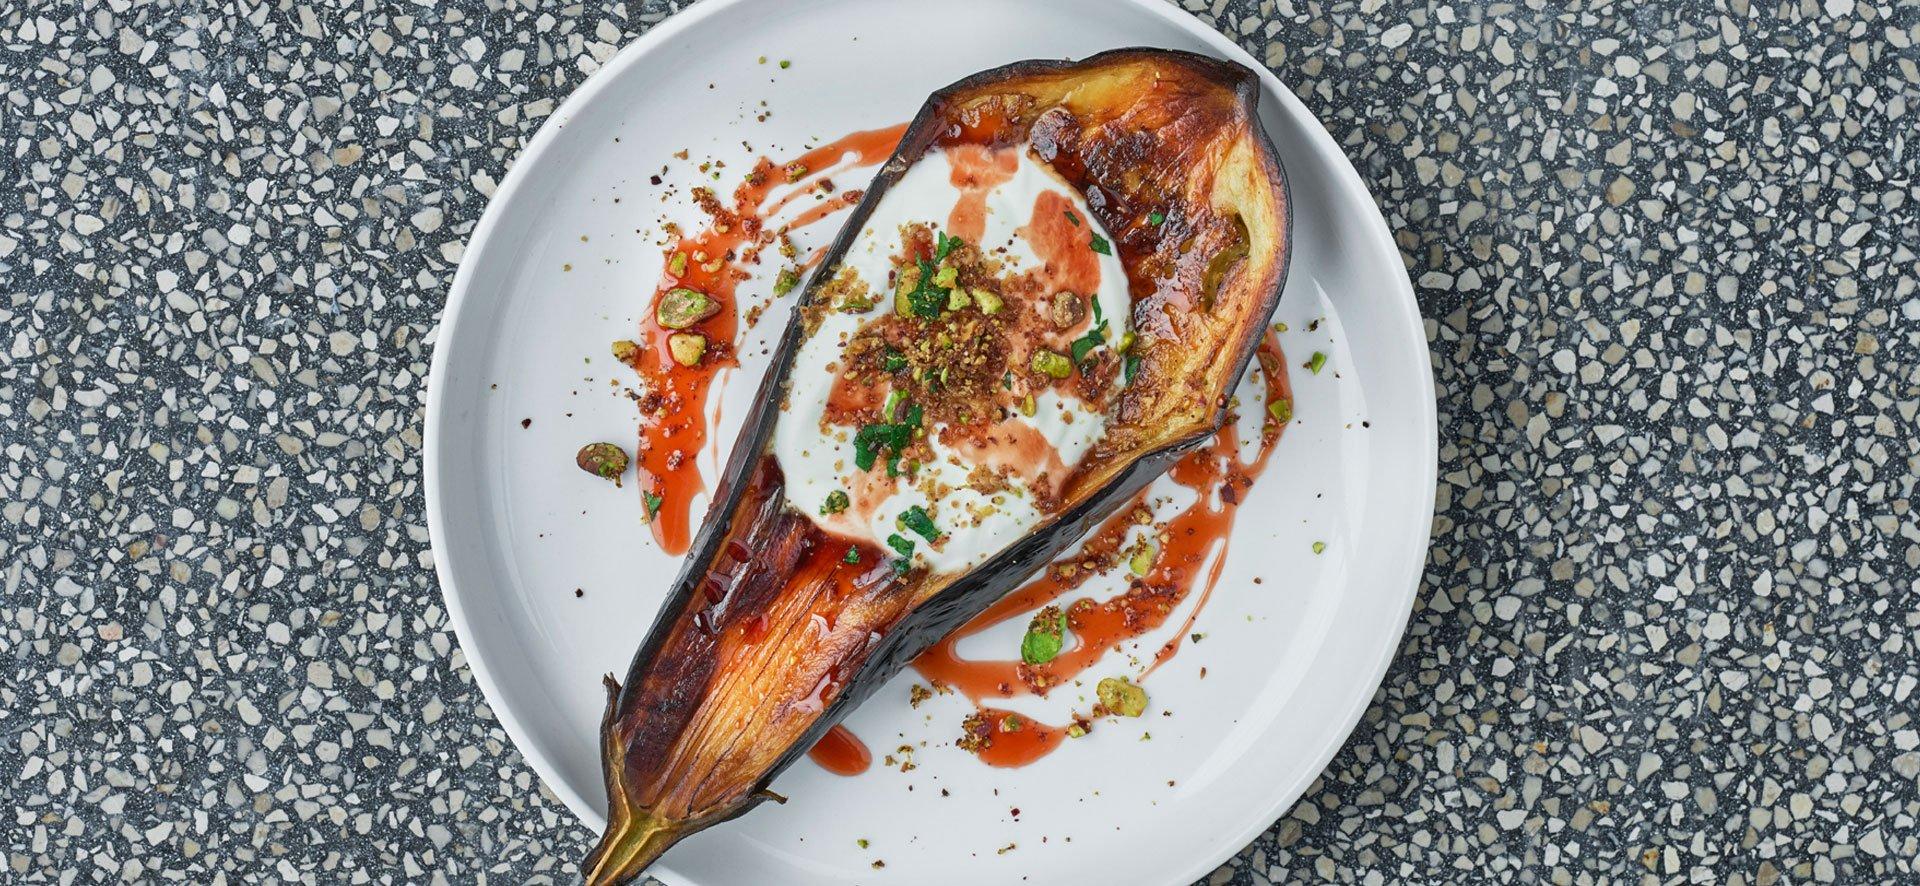 aubergine dish by Eran Tibi